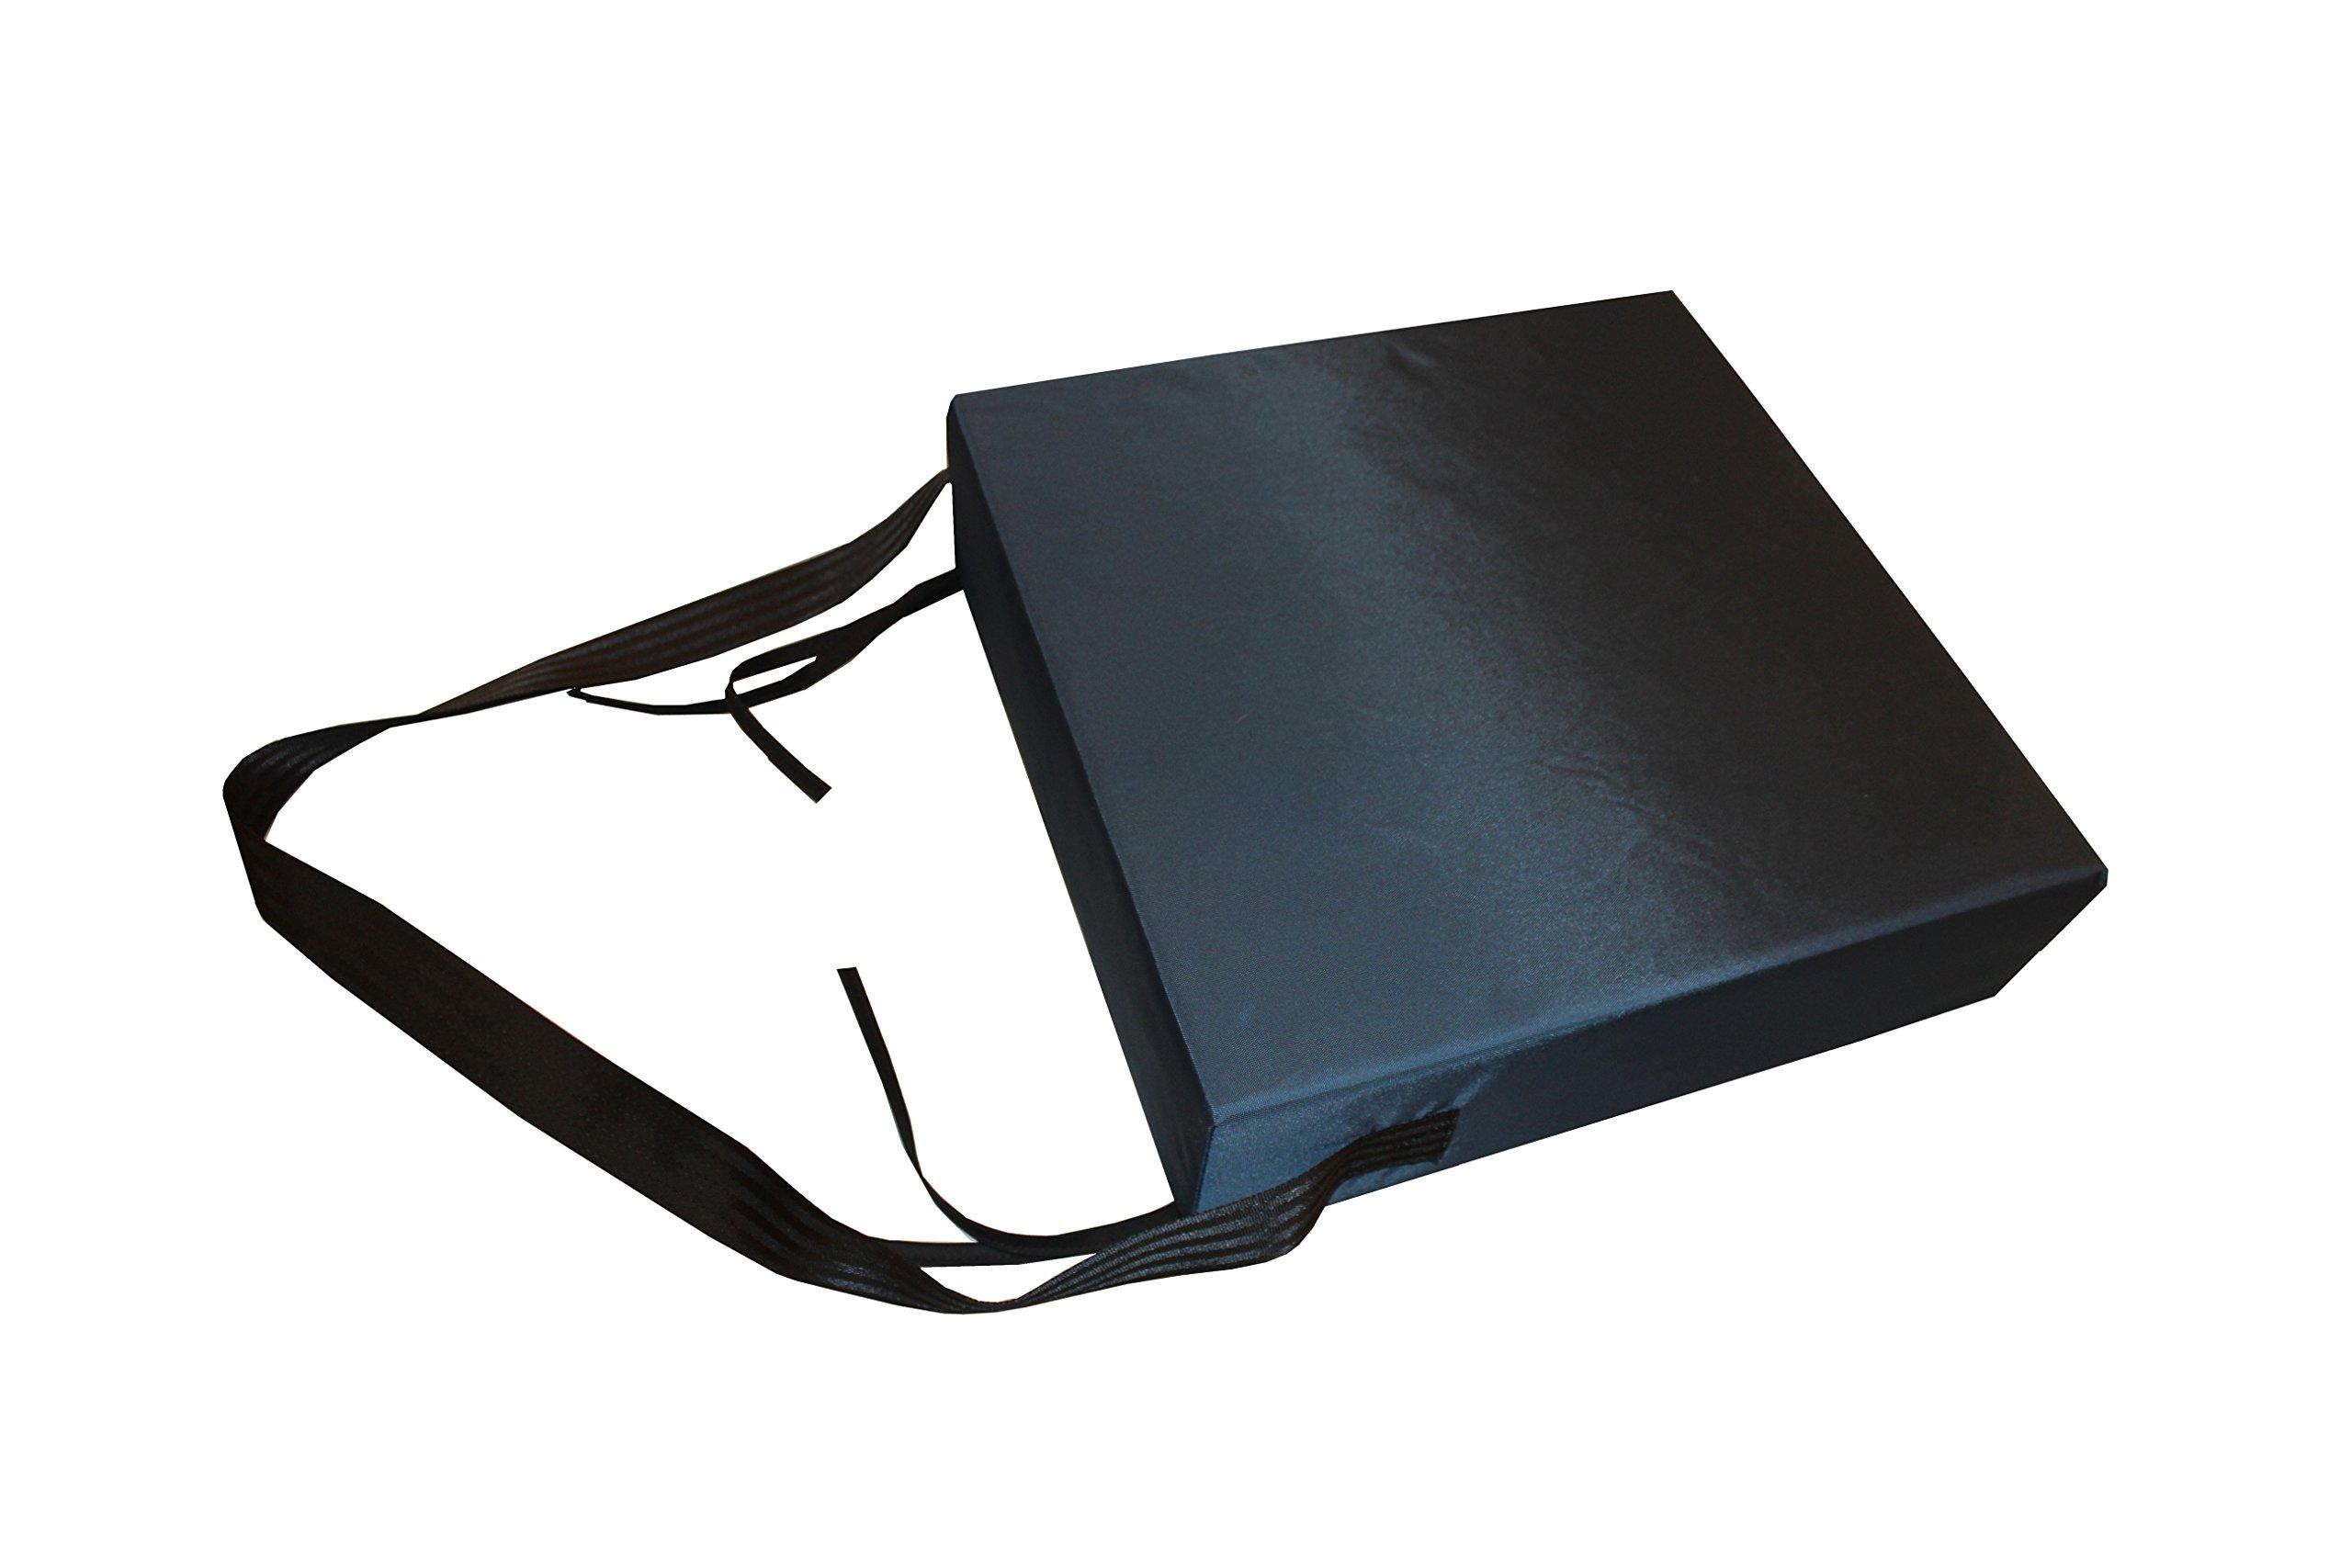 Rehabilitation Advantage Premium Seat Cushion 4 inch X 15 inch X 15 inch with Removable Cover by Rehabilitation Advantage